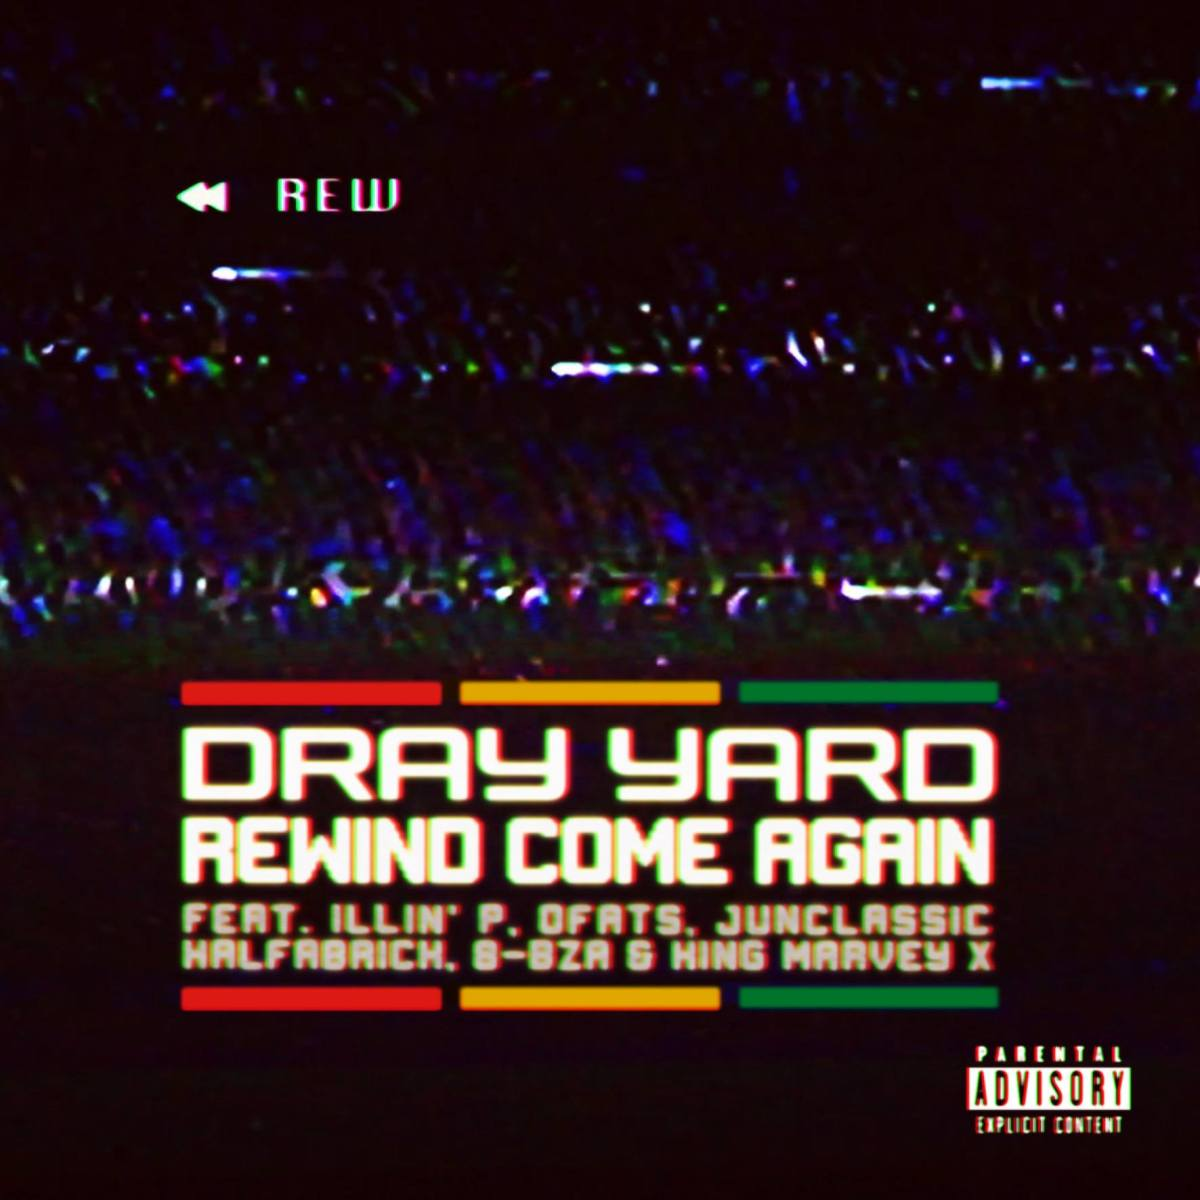 "Dray Yard (@DrayYard) F/ Illin' P, OFATS, Junclassic, HalfaBrick, 8-Bza & King Marvey X - ""Rewind"""